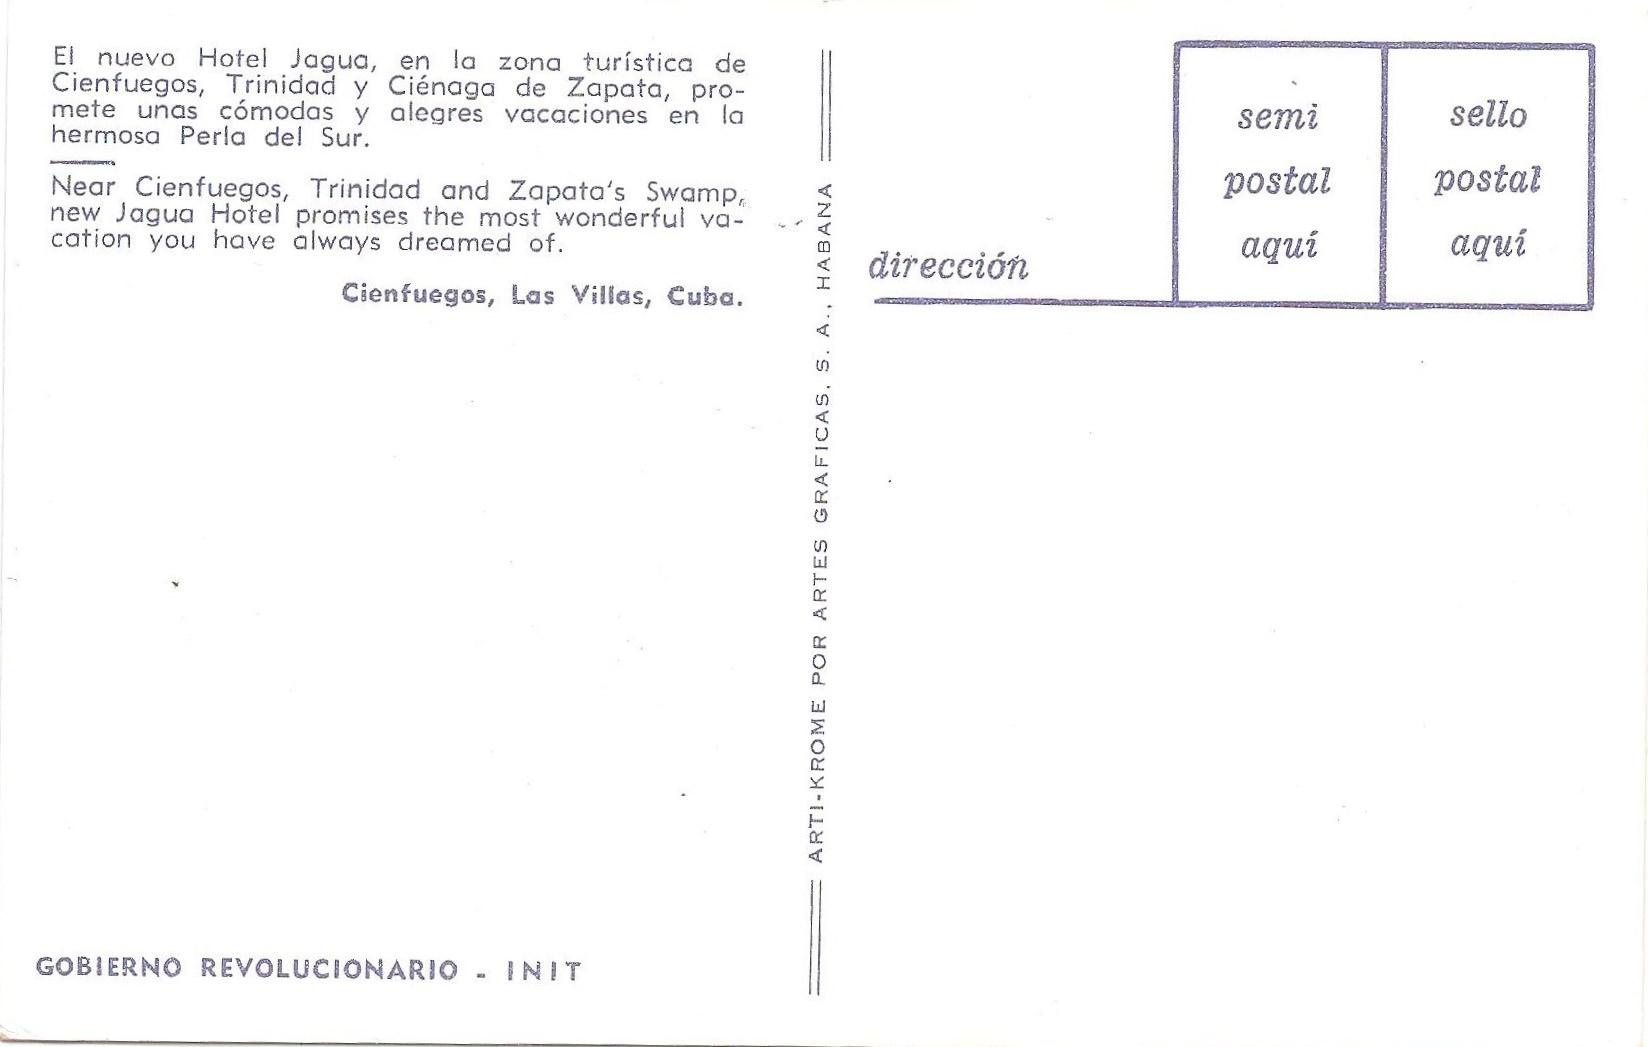 391. 2 открытка, VIII тип. Оборот